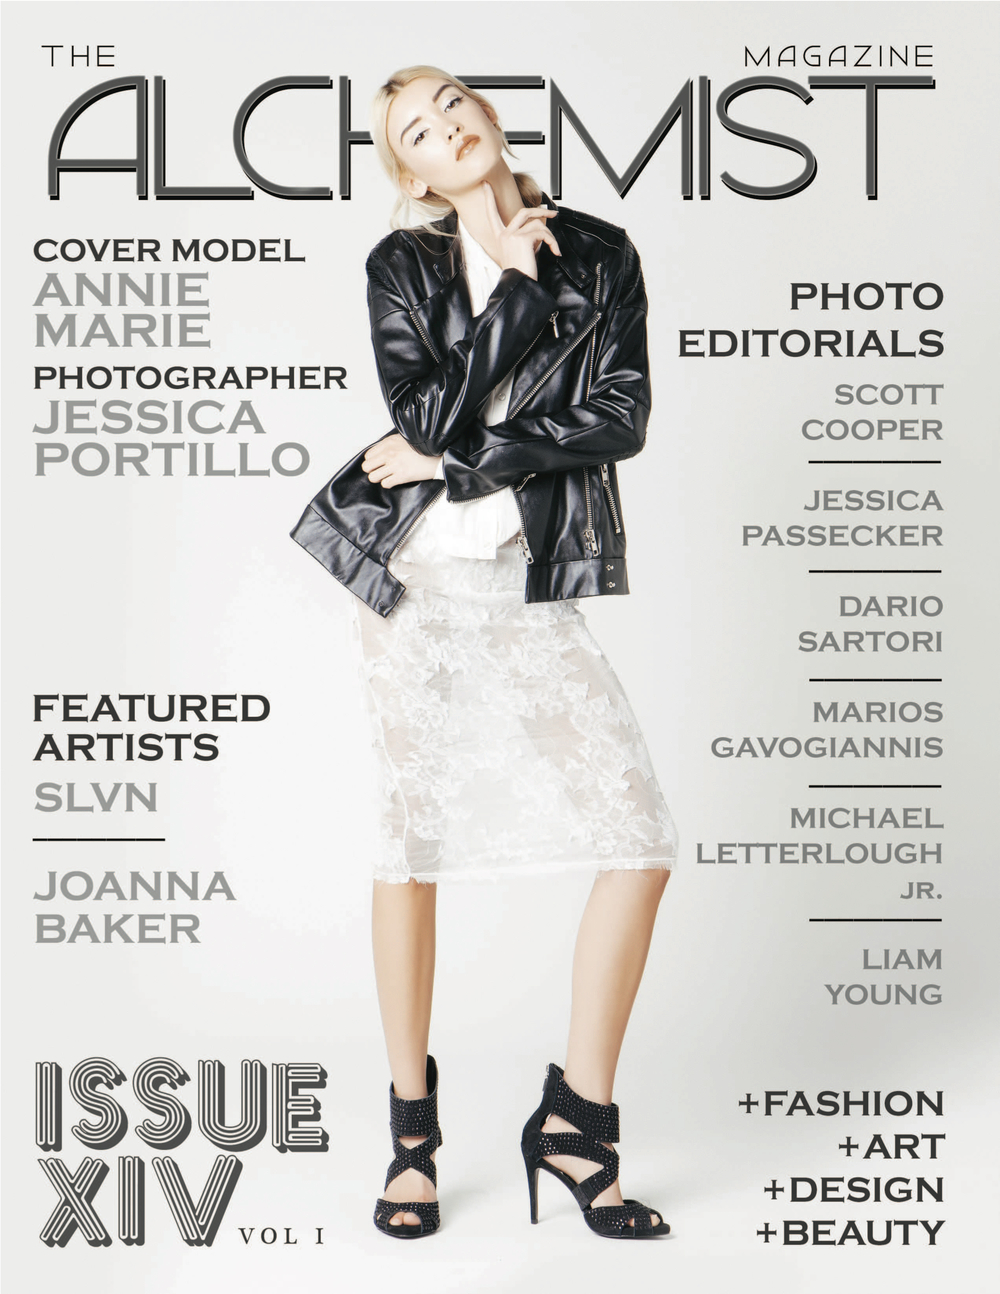 Jessica Portillo - Alchemist Magazine Issue XIV Vol I - Tear Sheets.jpg